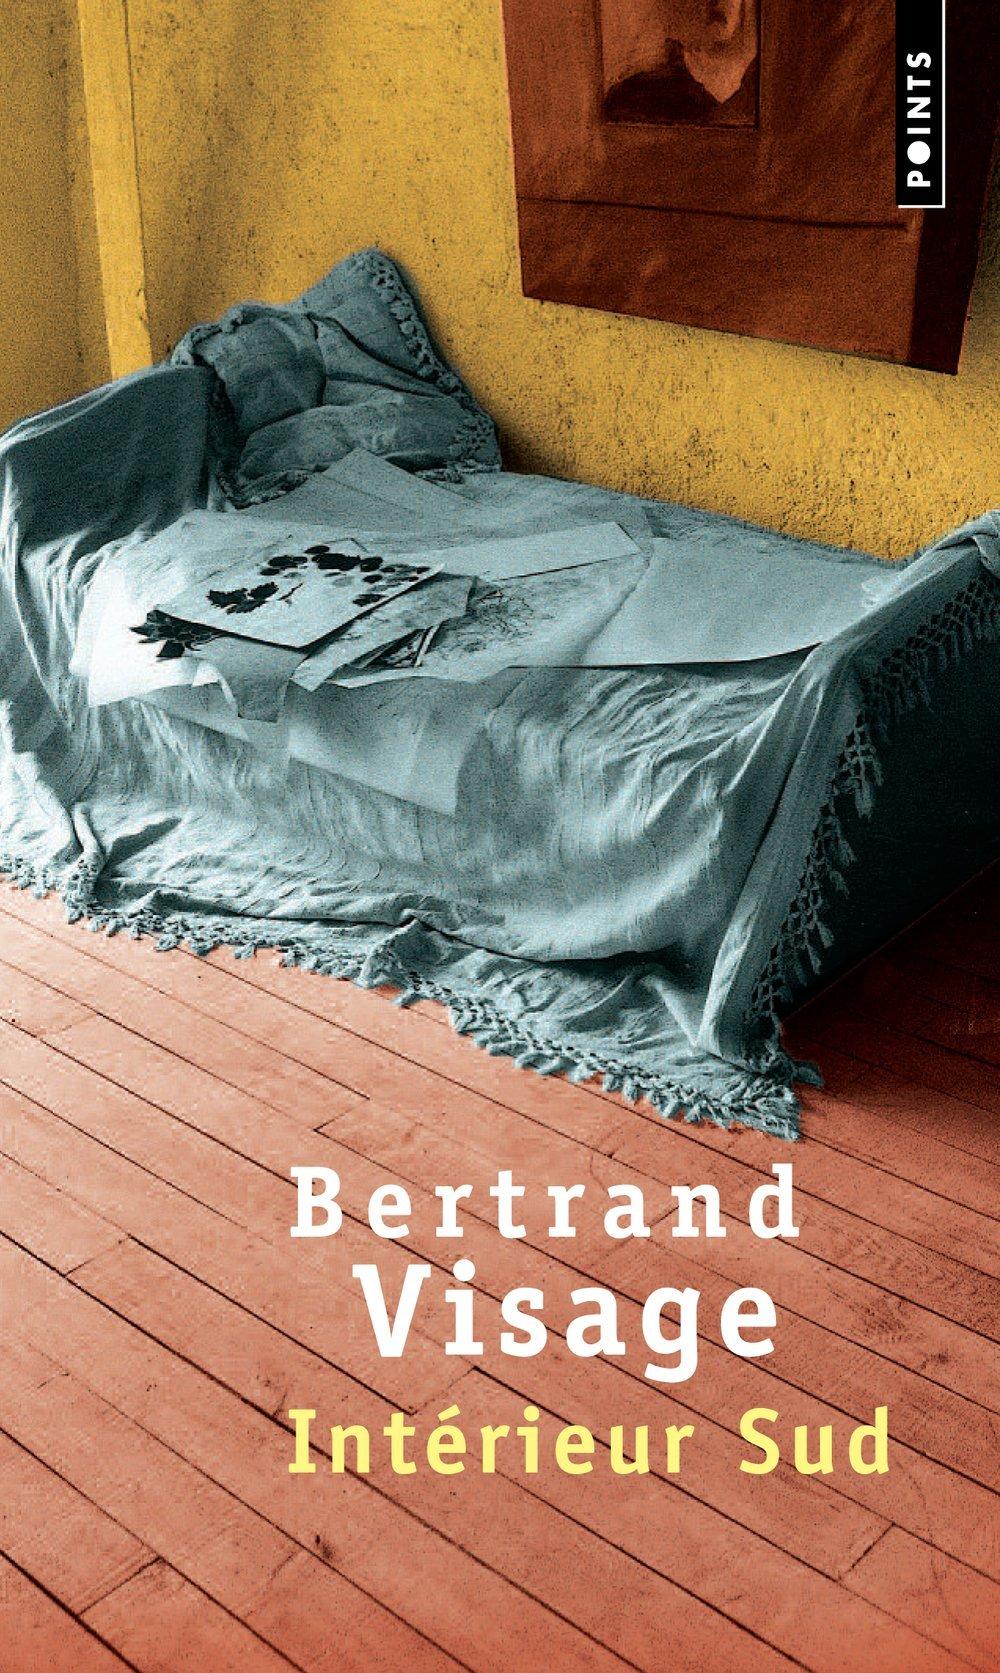 Intérieur Sud: Amazon.de: Bertrand Visage: Fremdsprachige Bücher